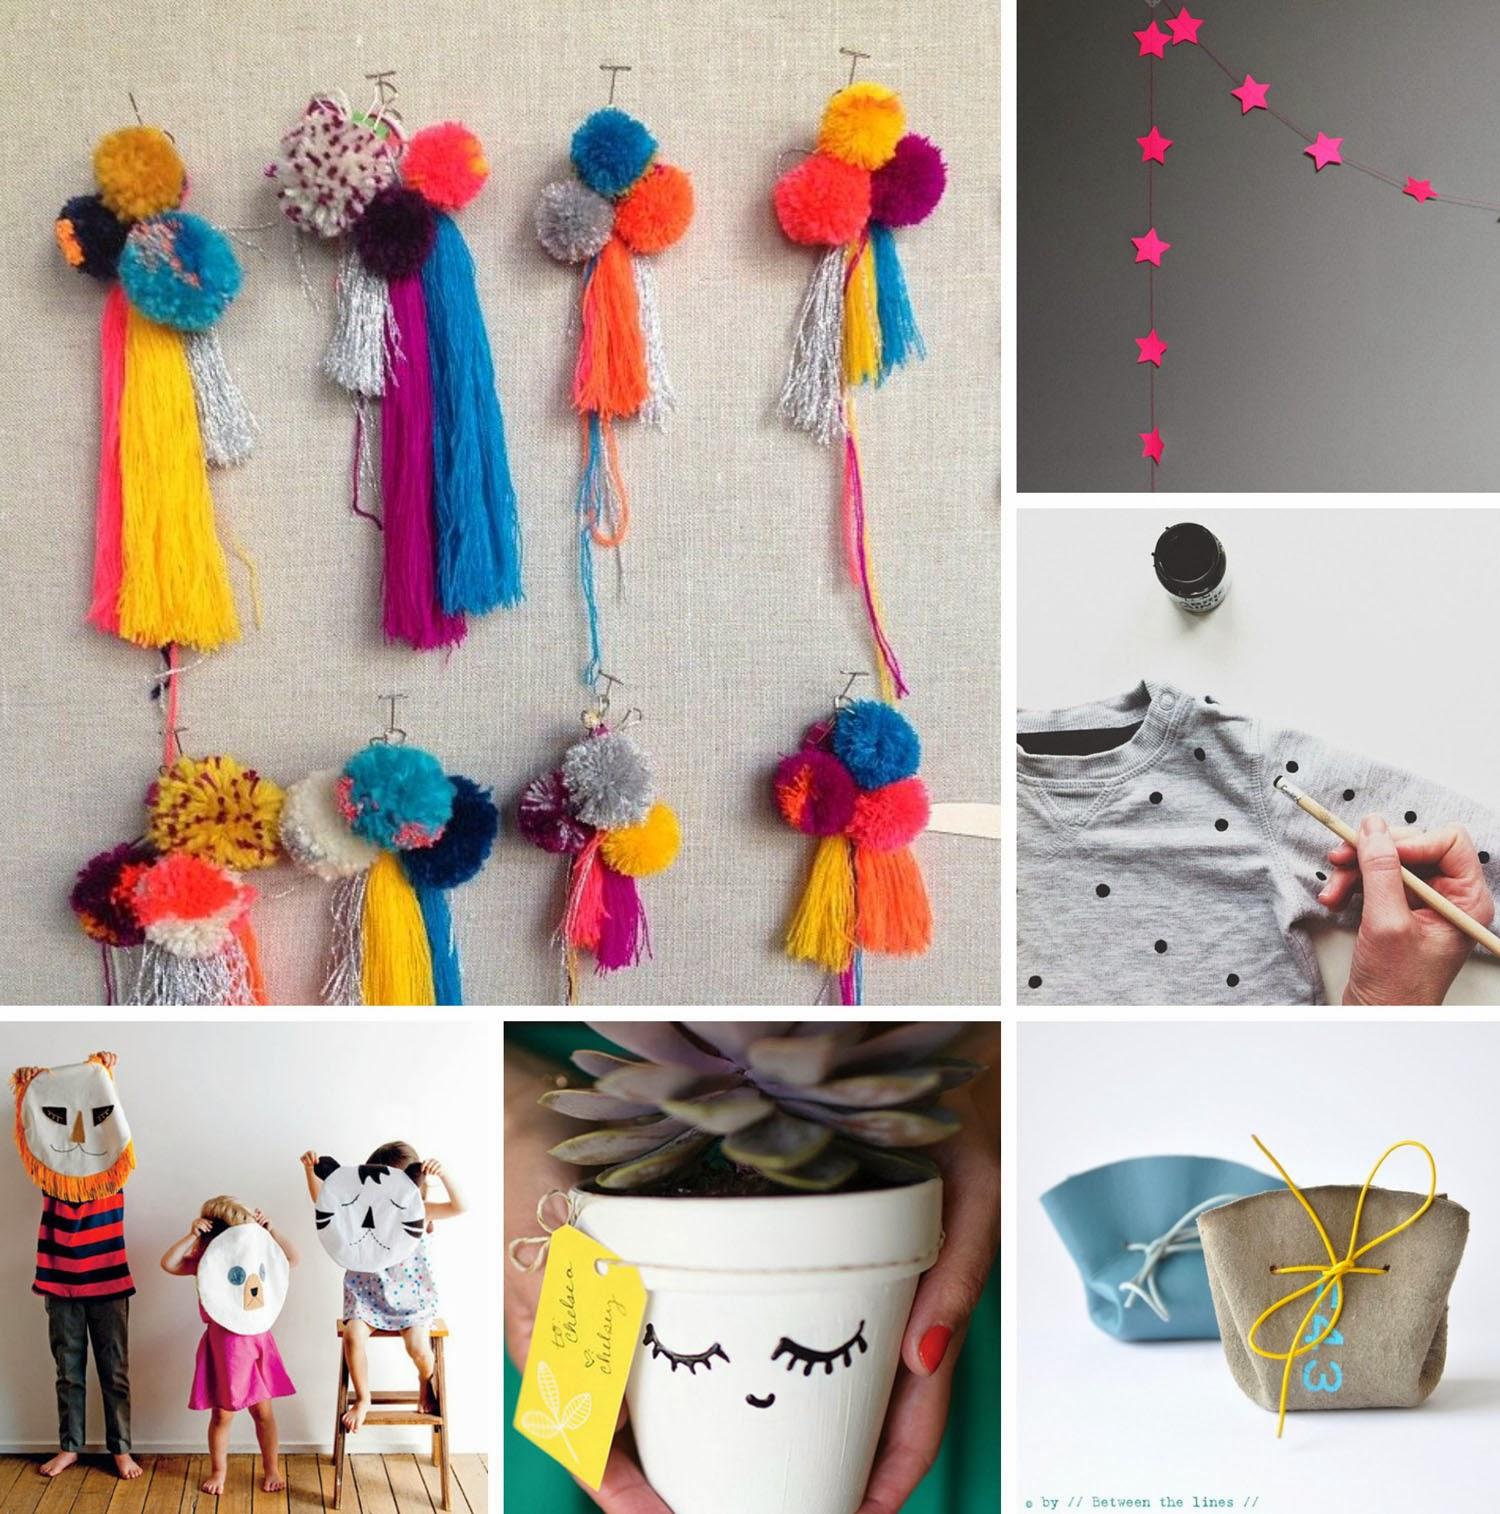 Moose bird pinboard handmade gift ideas for Handmade things